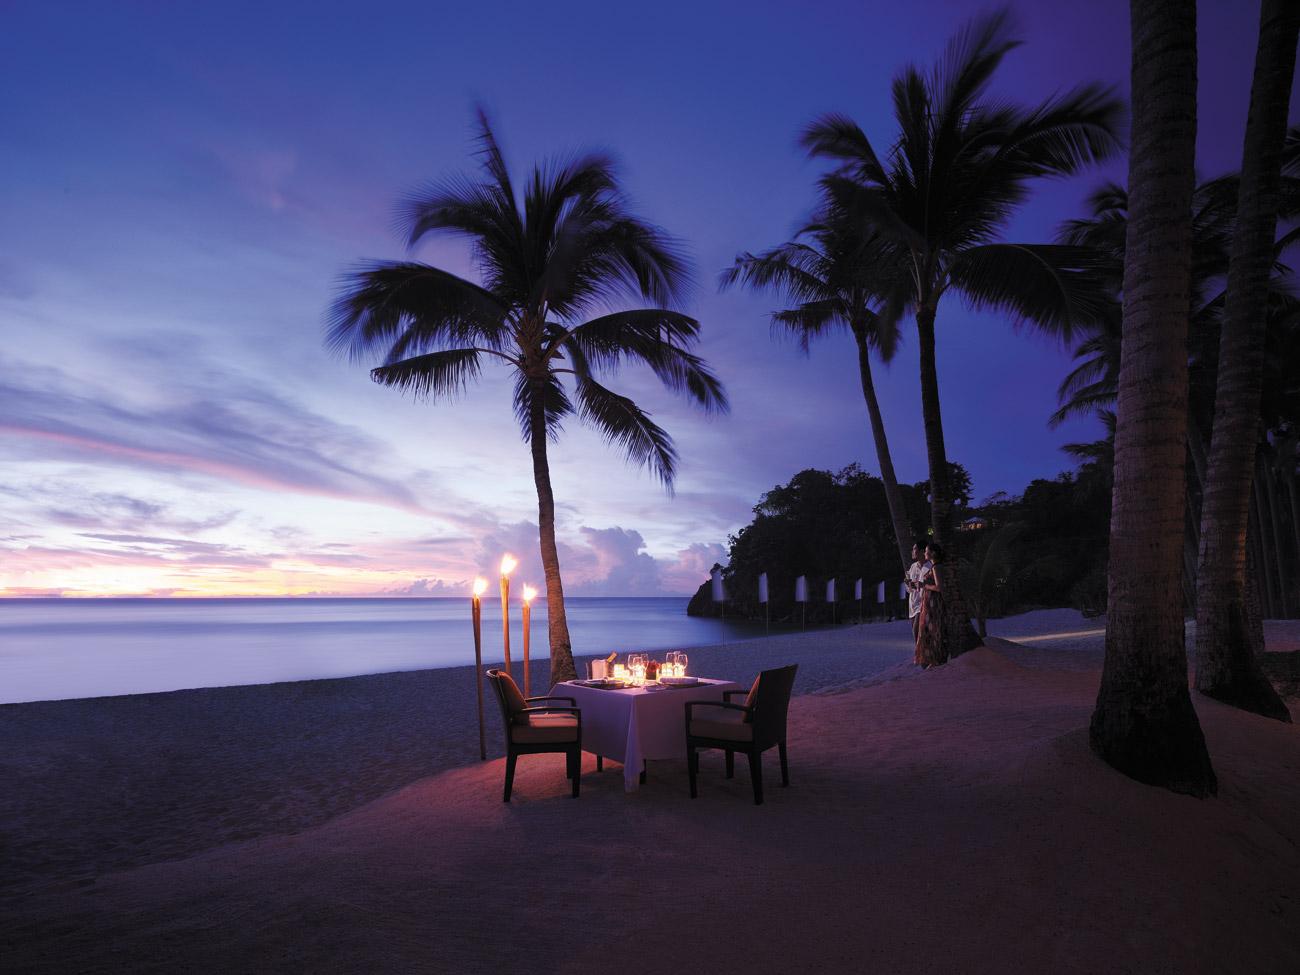 SLBO-Gallery-Romantic-Dinner-by-the-beach.jpg